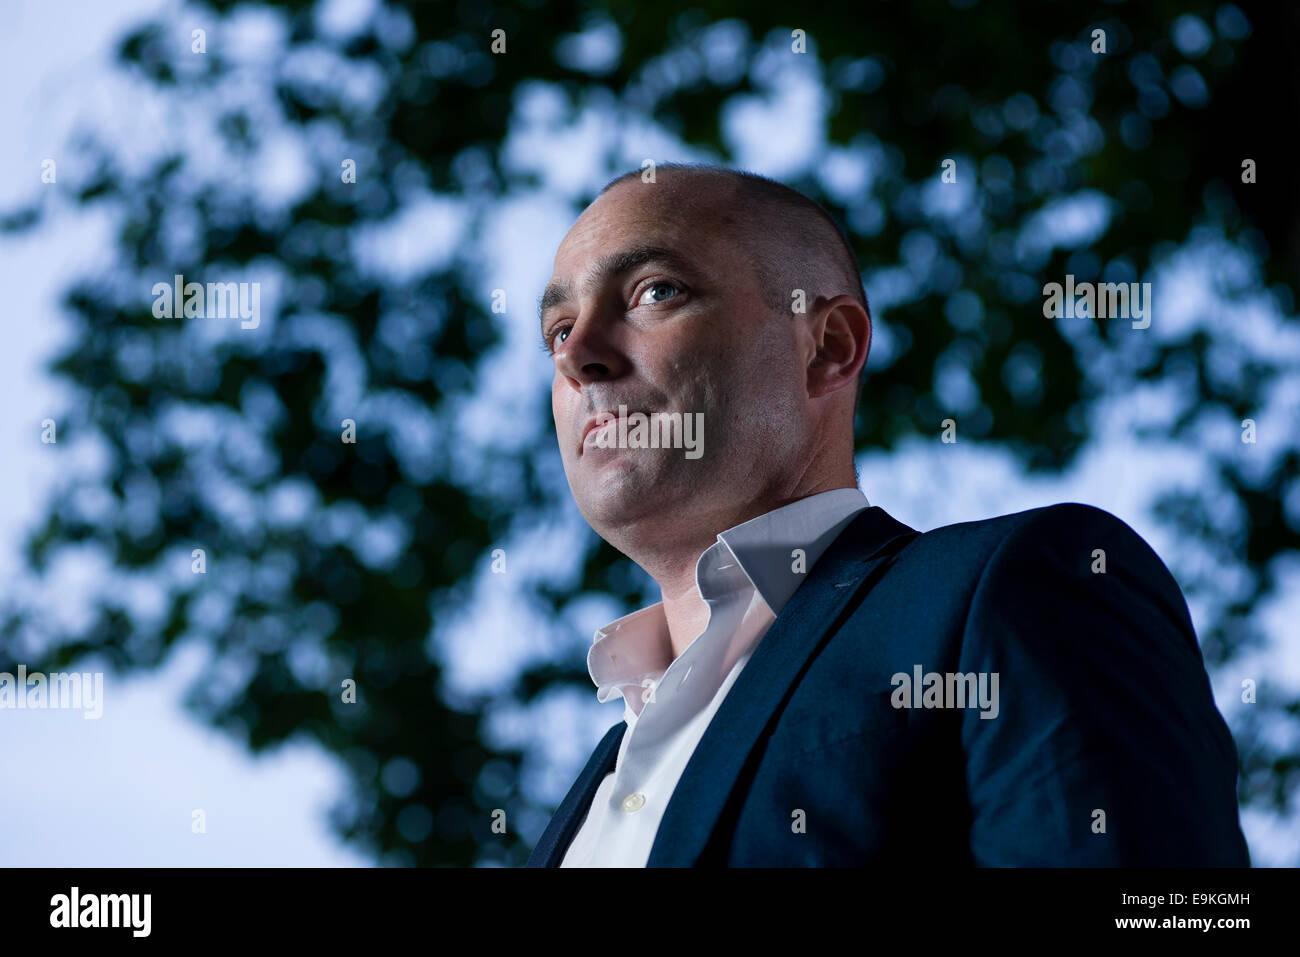 Irish writer Donal Ryan appears at the Edinburgh International Book Festival. - Stock Image